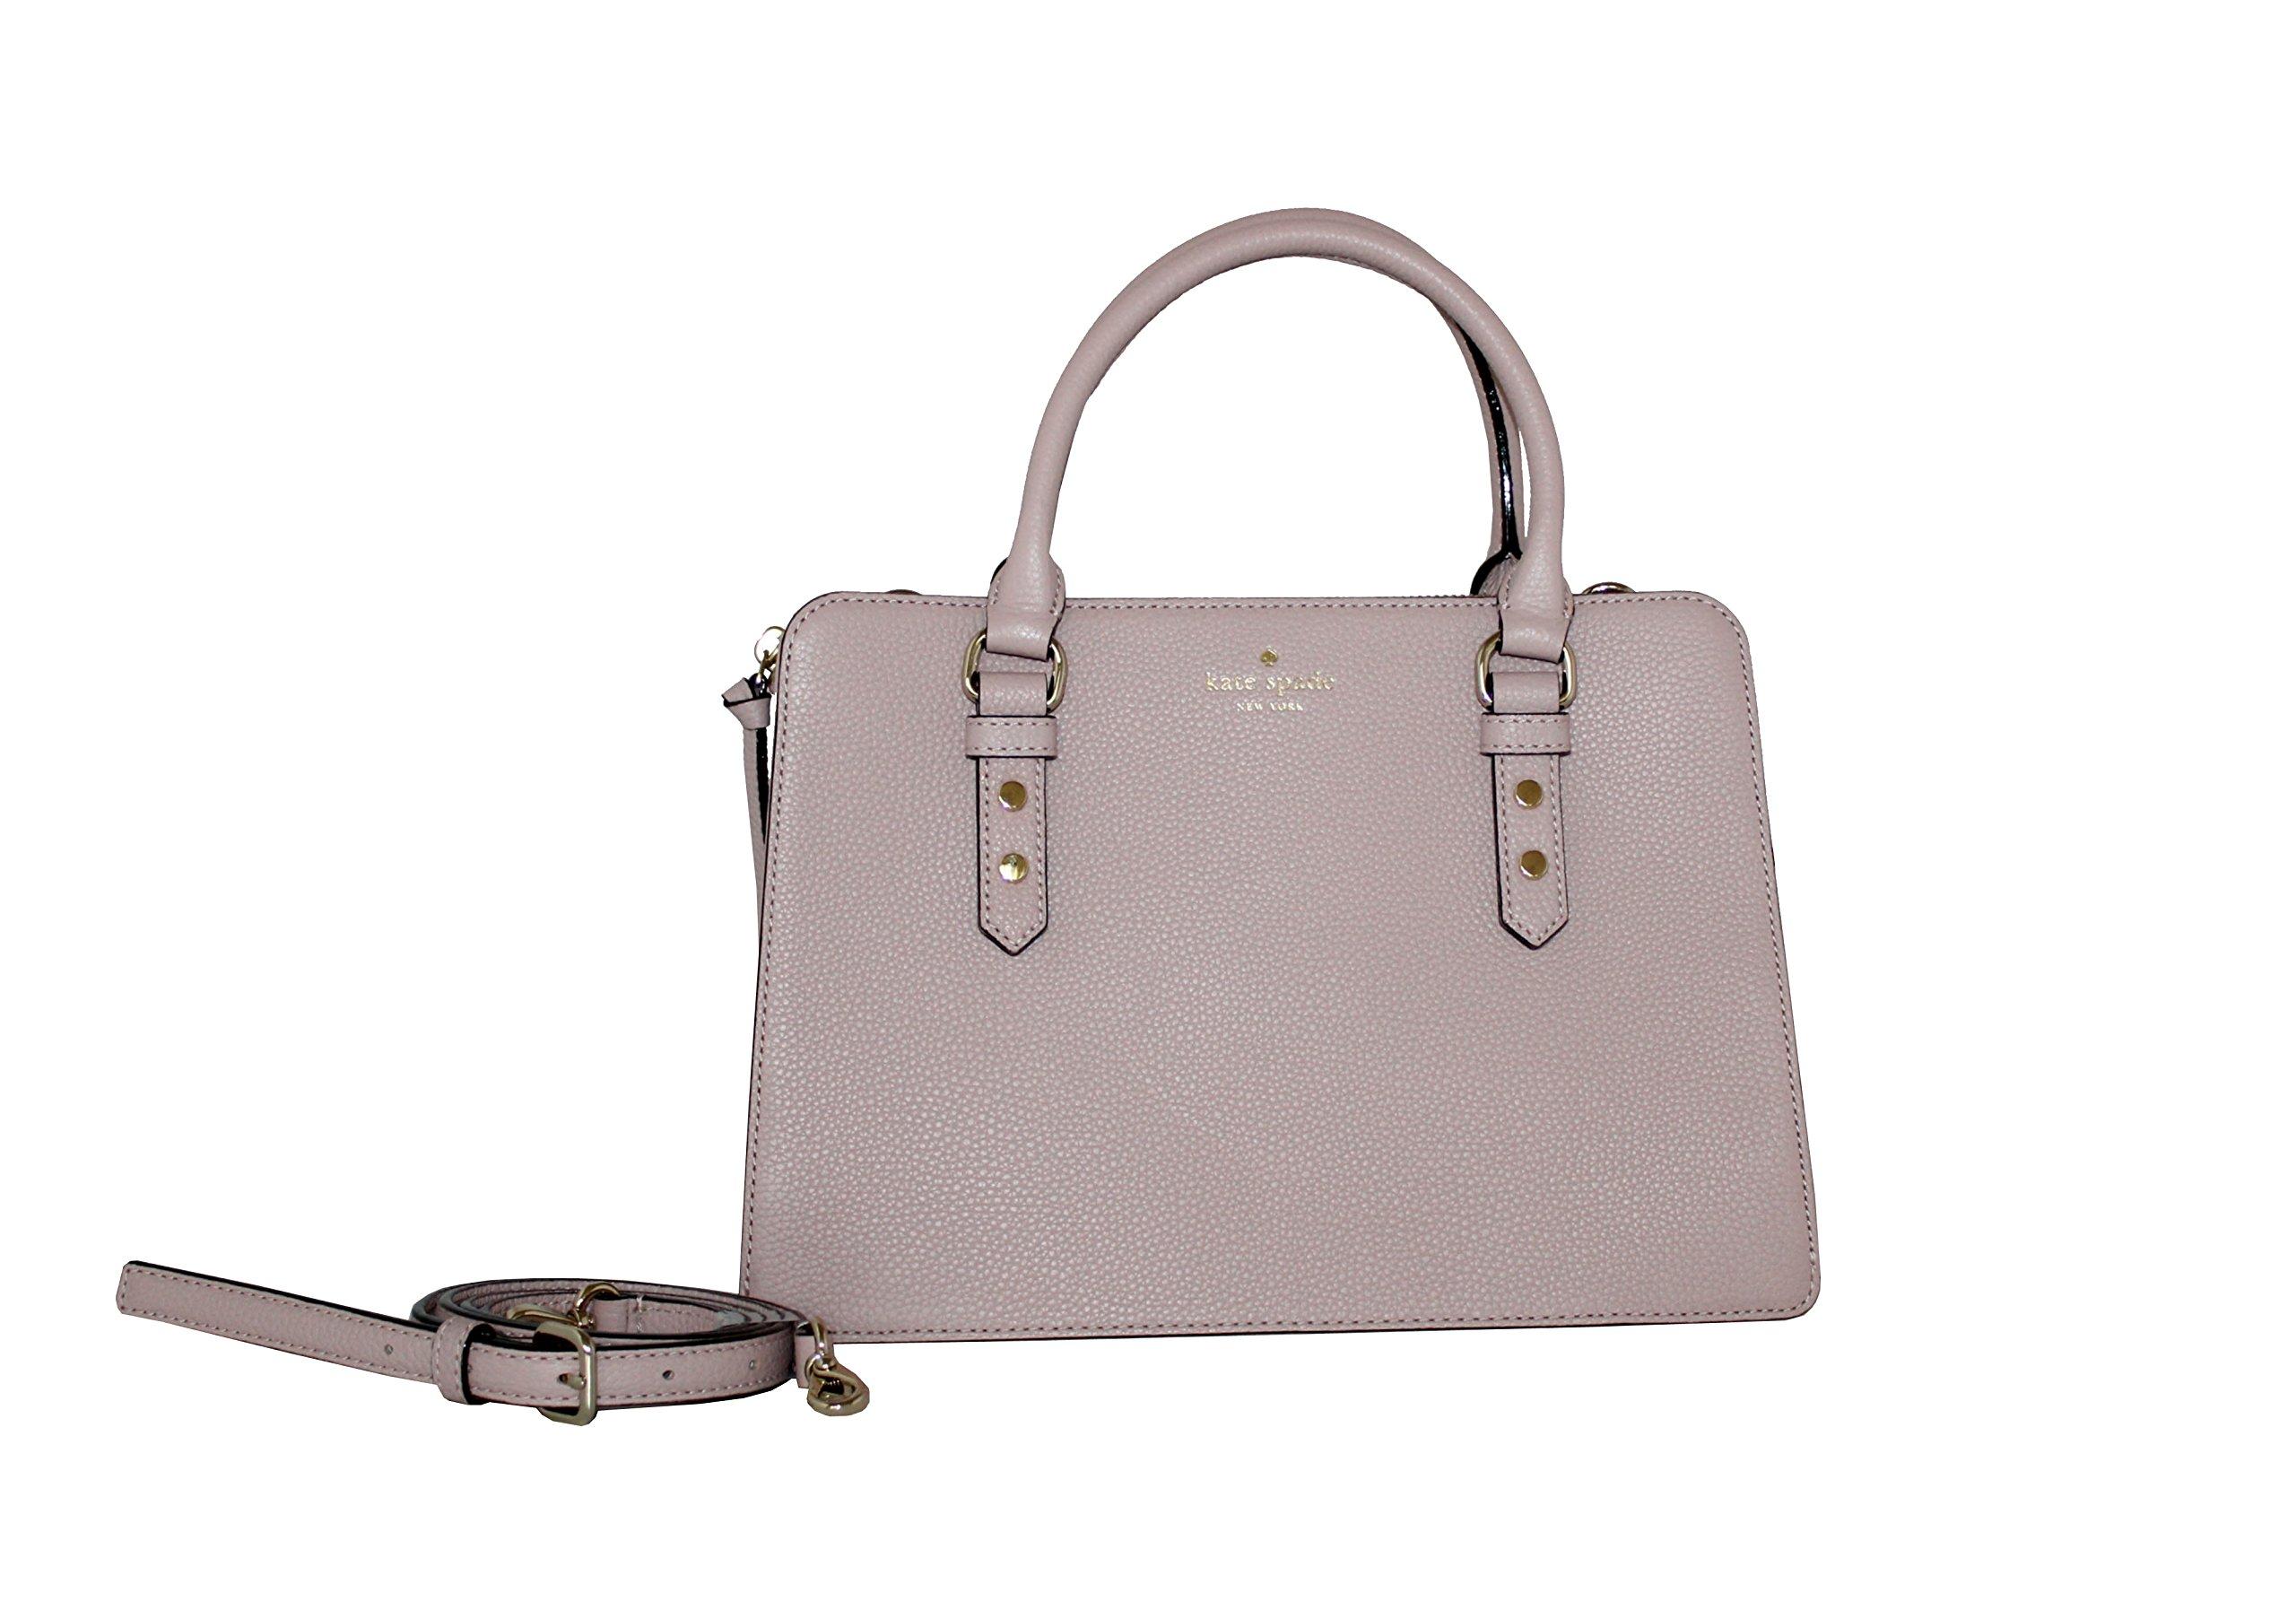 Kate Spade New York Lise Mulberry Street Satchel Crossbody Pebble Leather Handbag by Kate Spade New York